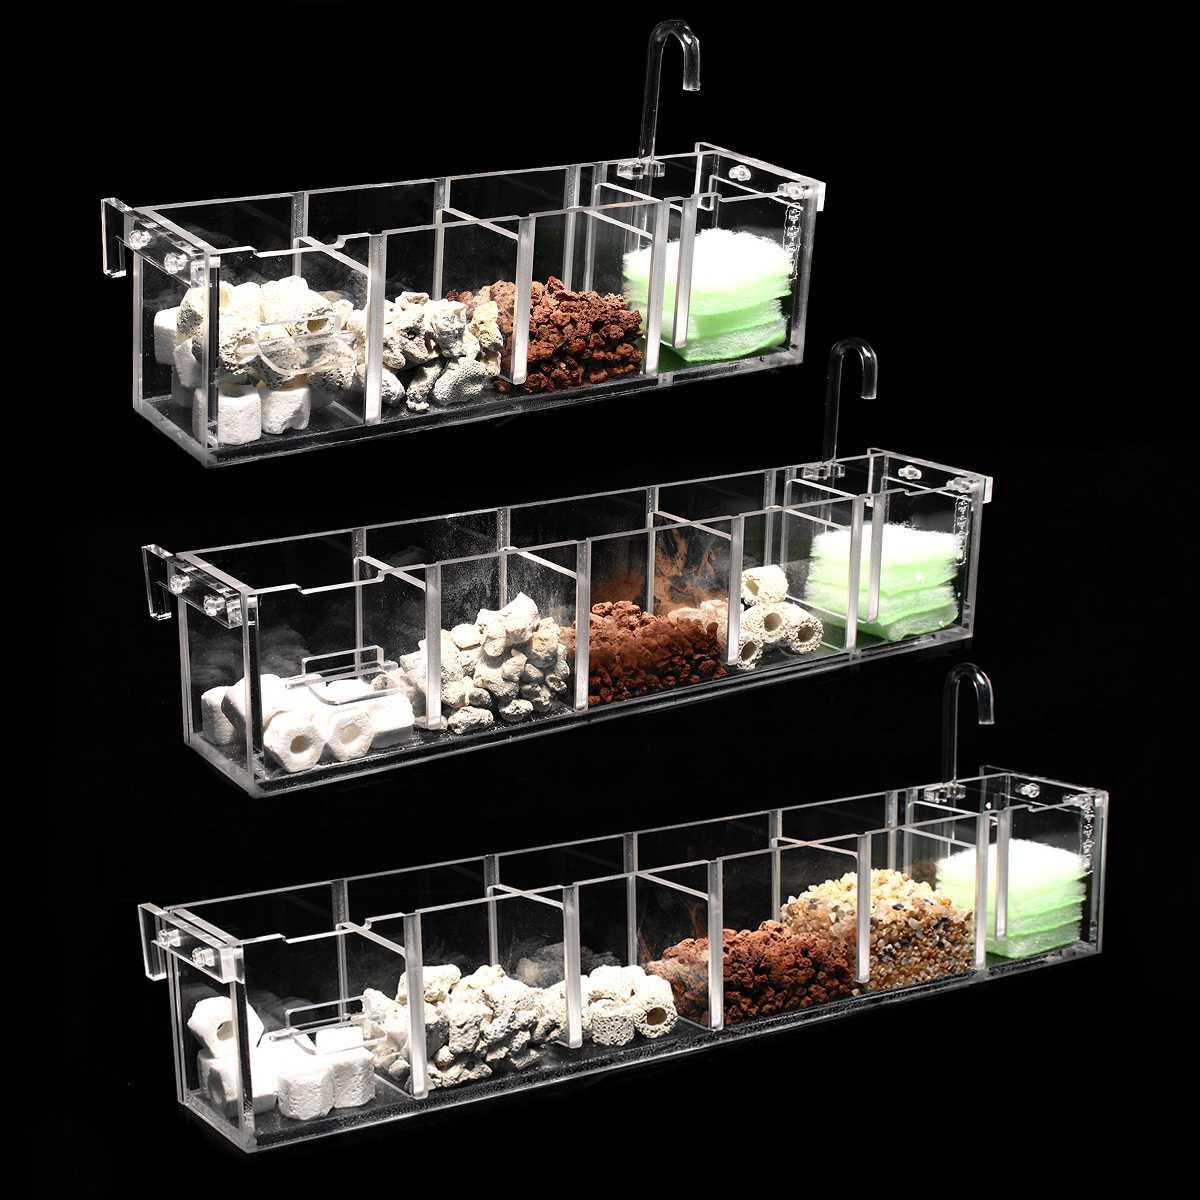 2 6 Grids Fish Tank Aquarium Filter Box Acrylic External Hanging Water Purifier Aquatic font b